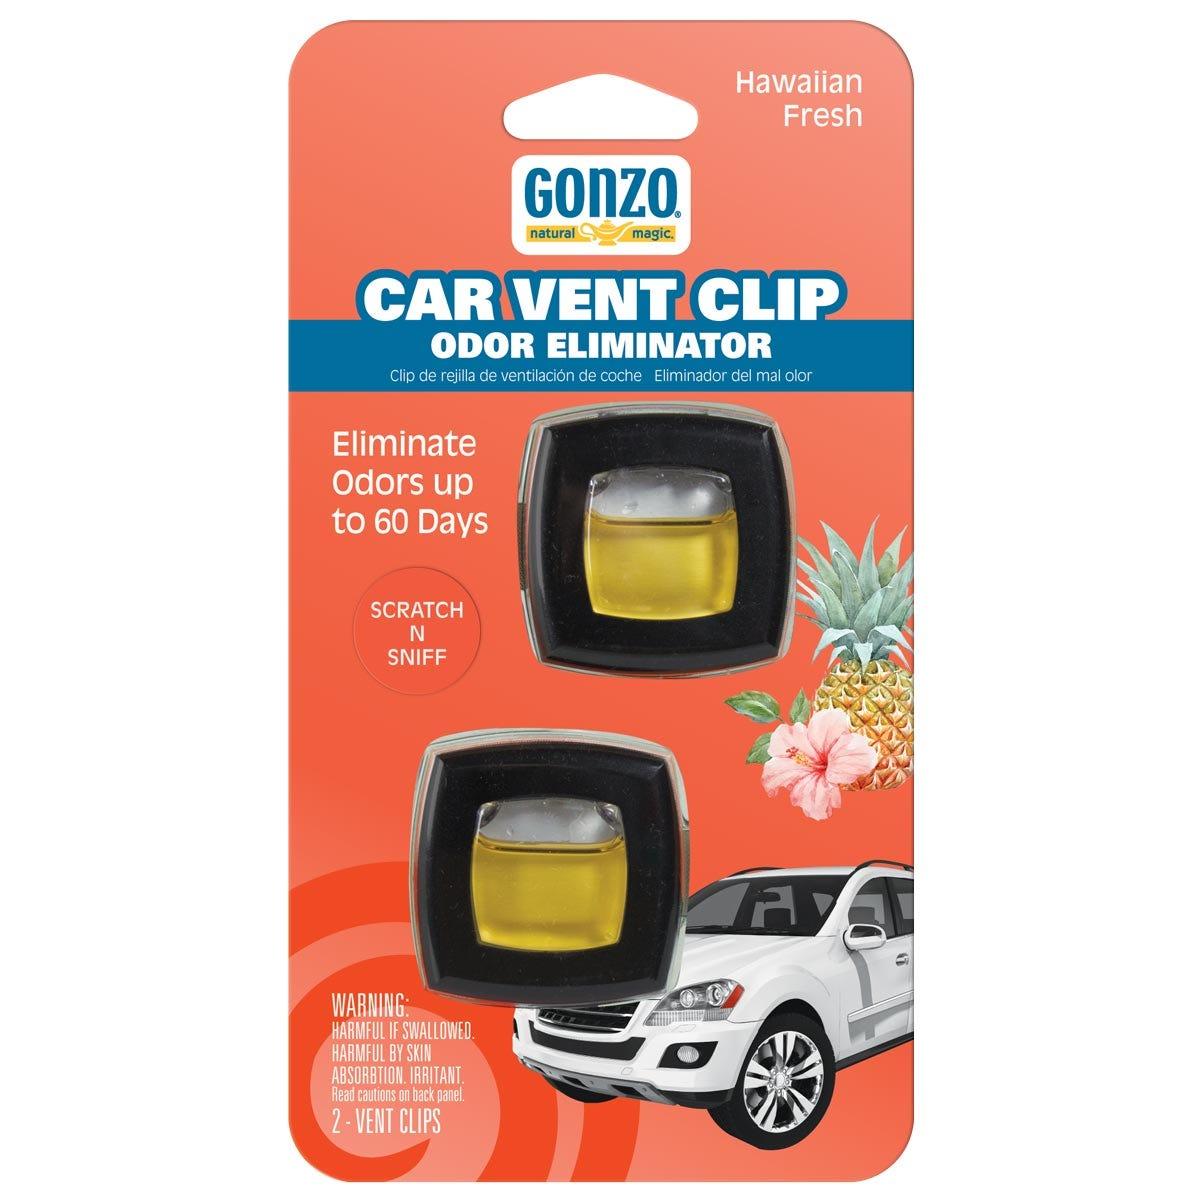 https://googone.com/media/catalog/product/c/a/car-vent-air-freshener_front_1.jpg